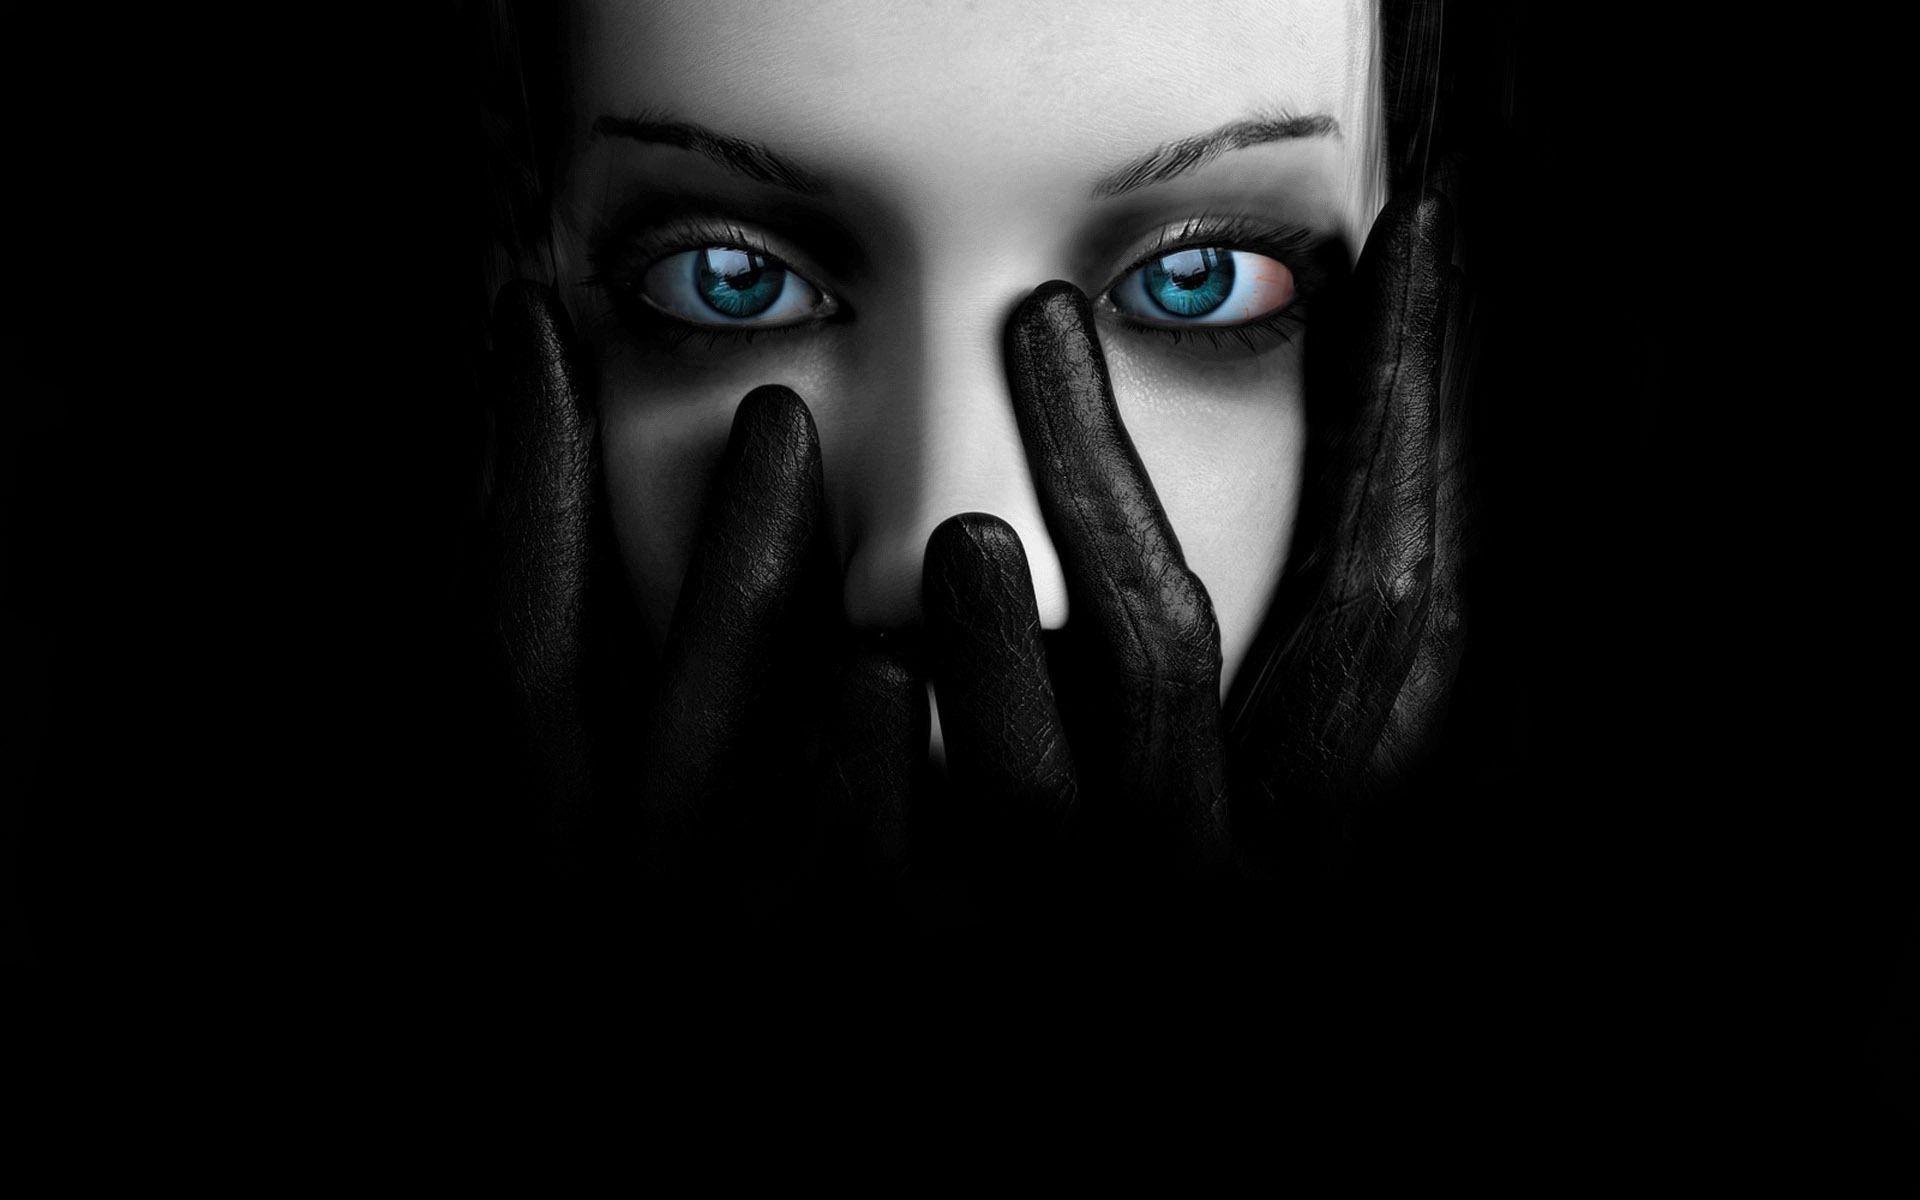 Black And Blue Eyes Wallpaper Black Hd Wallpaper Gothic Wallpaper